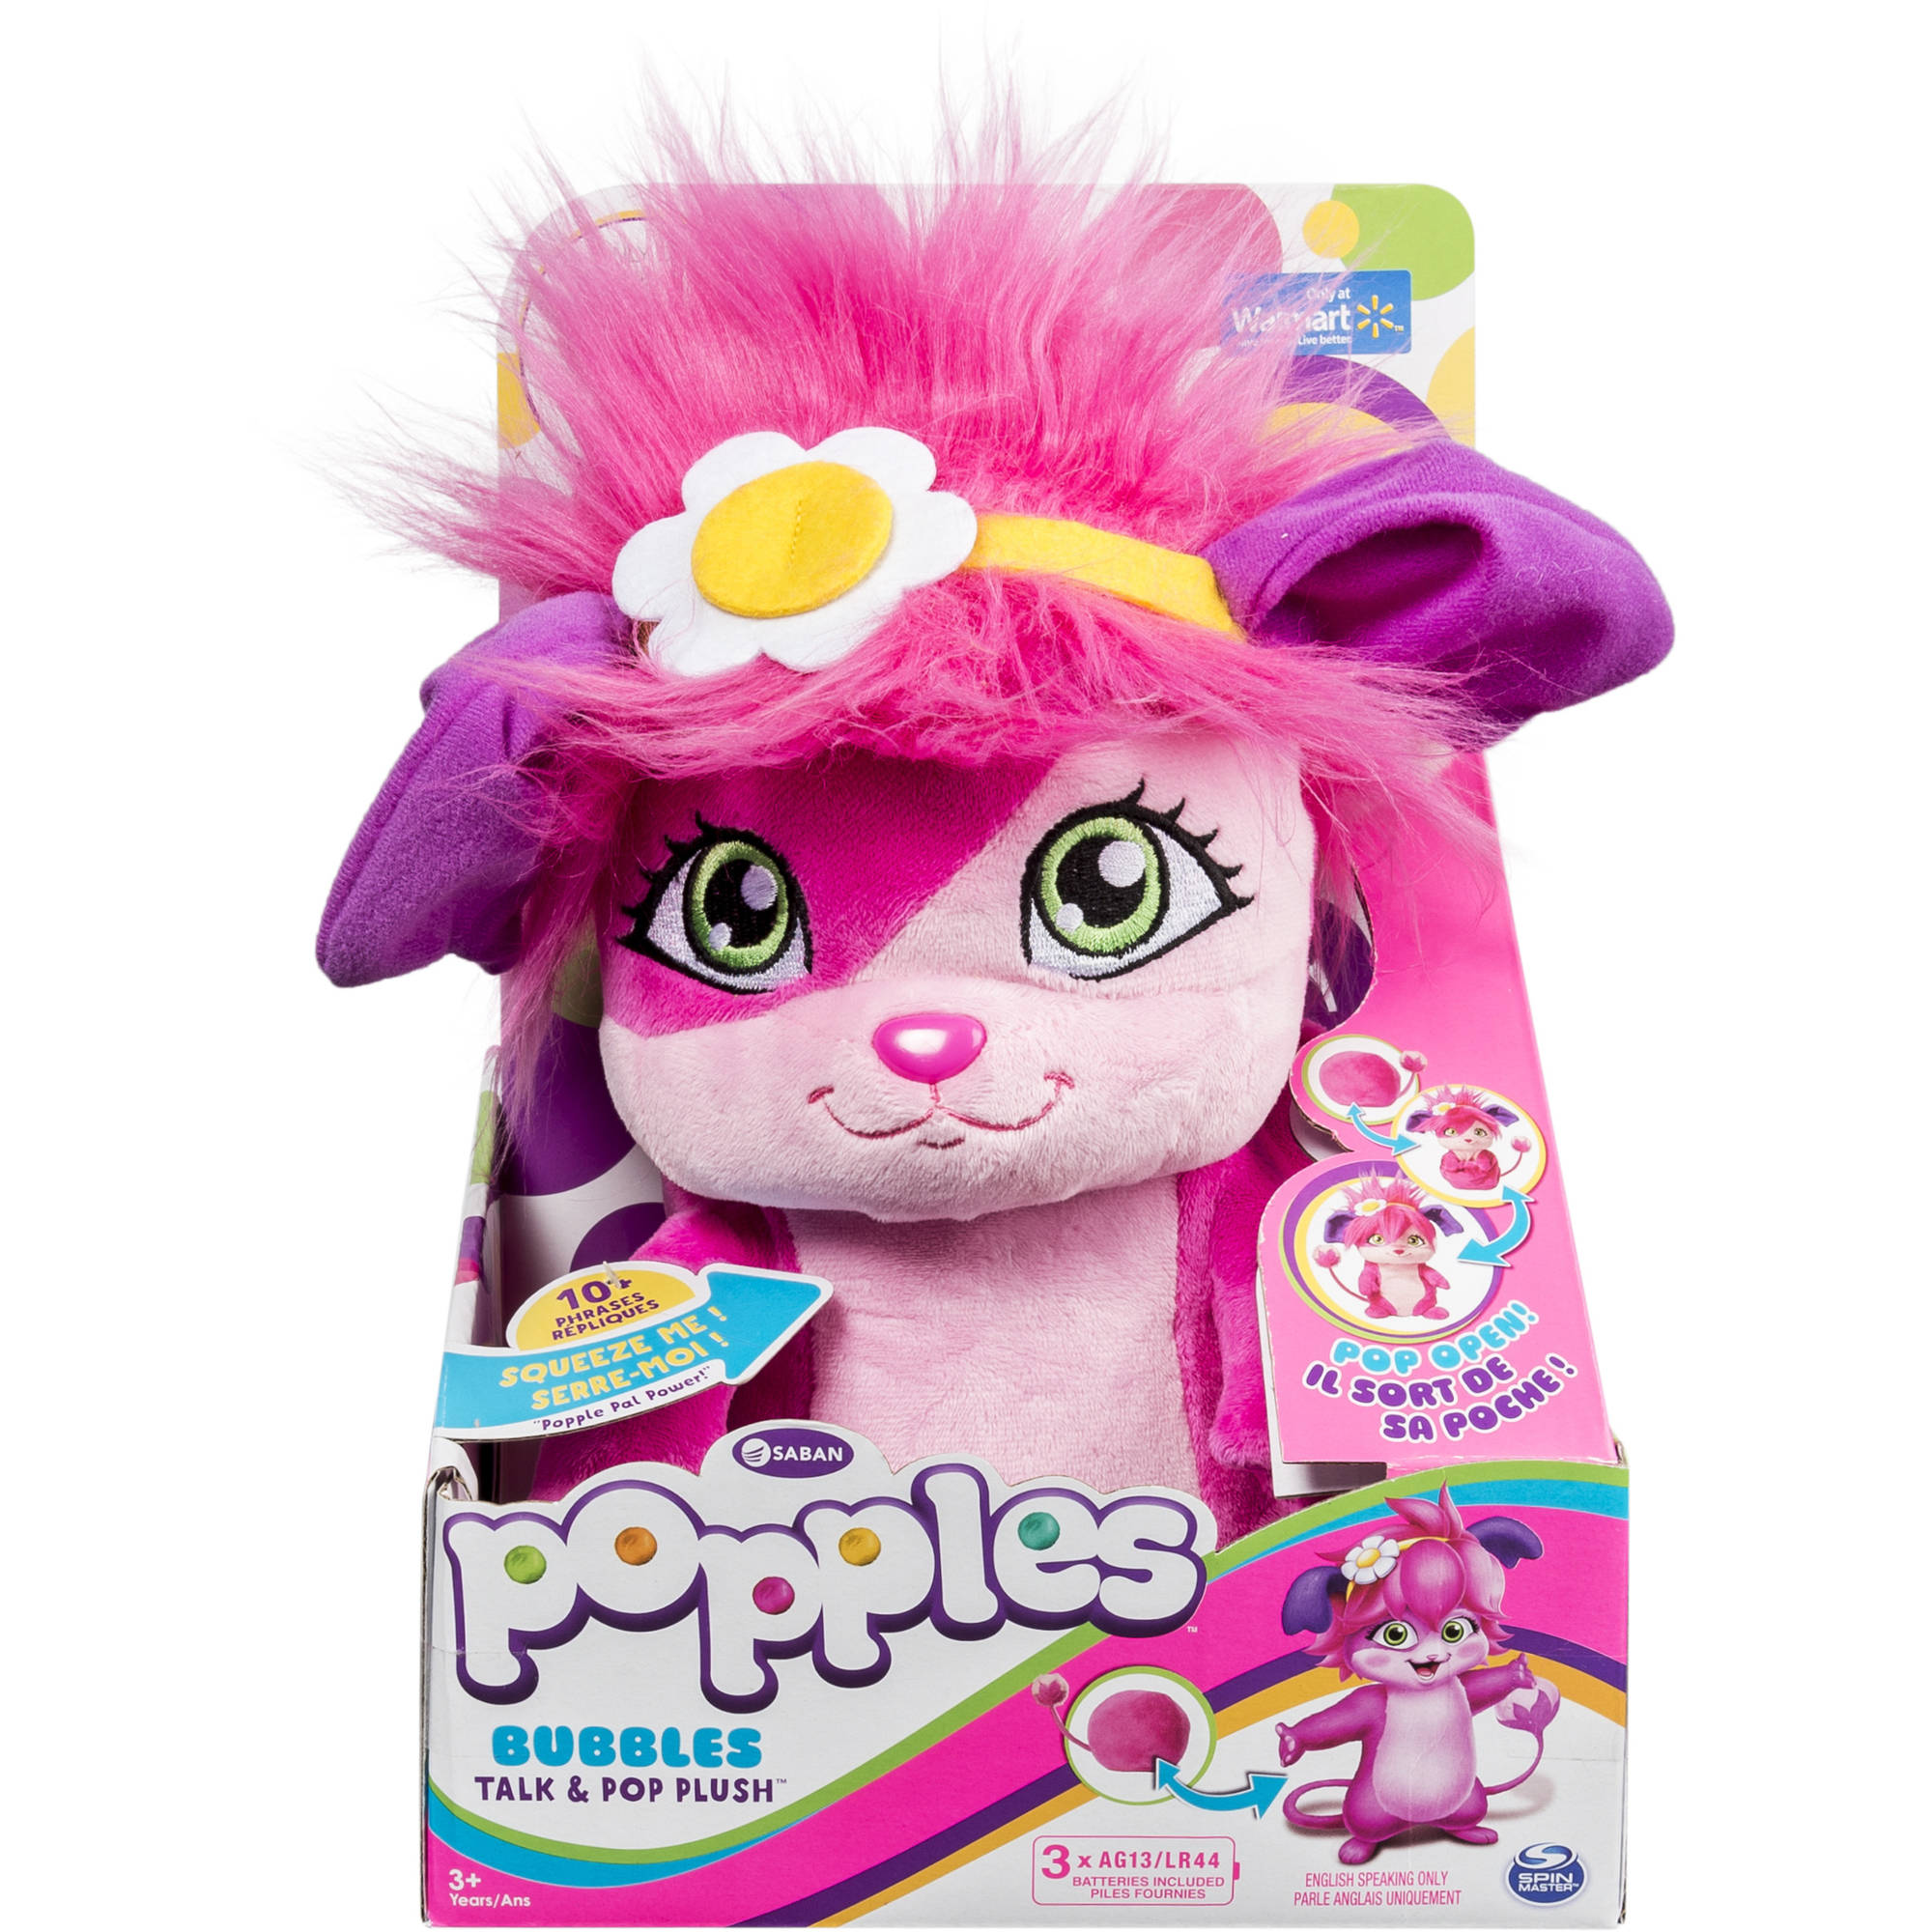 "Popples Talk and Pop 11"" Plush, Bubbles"